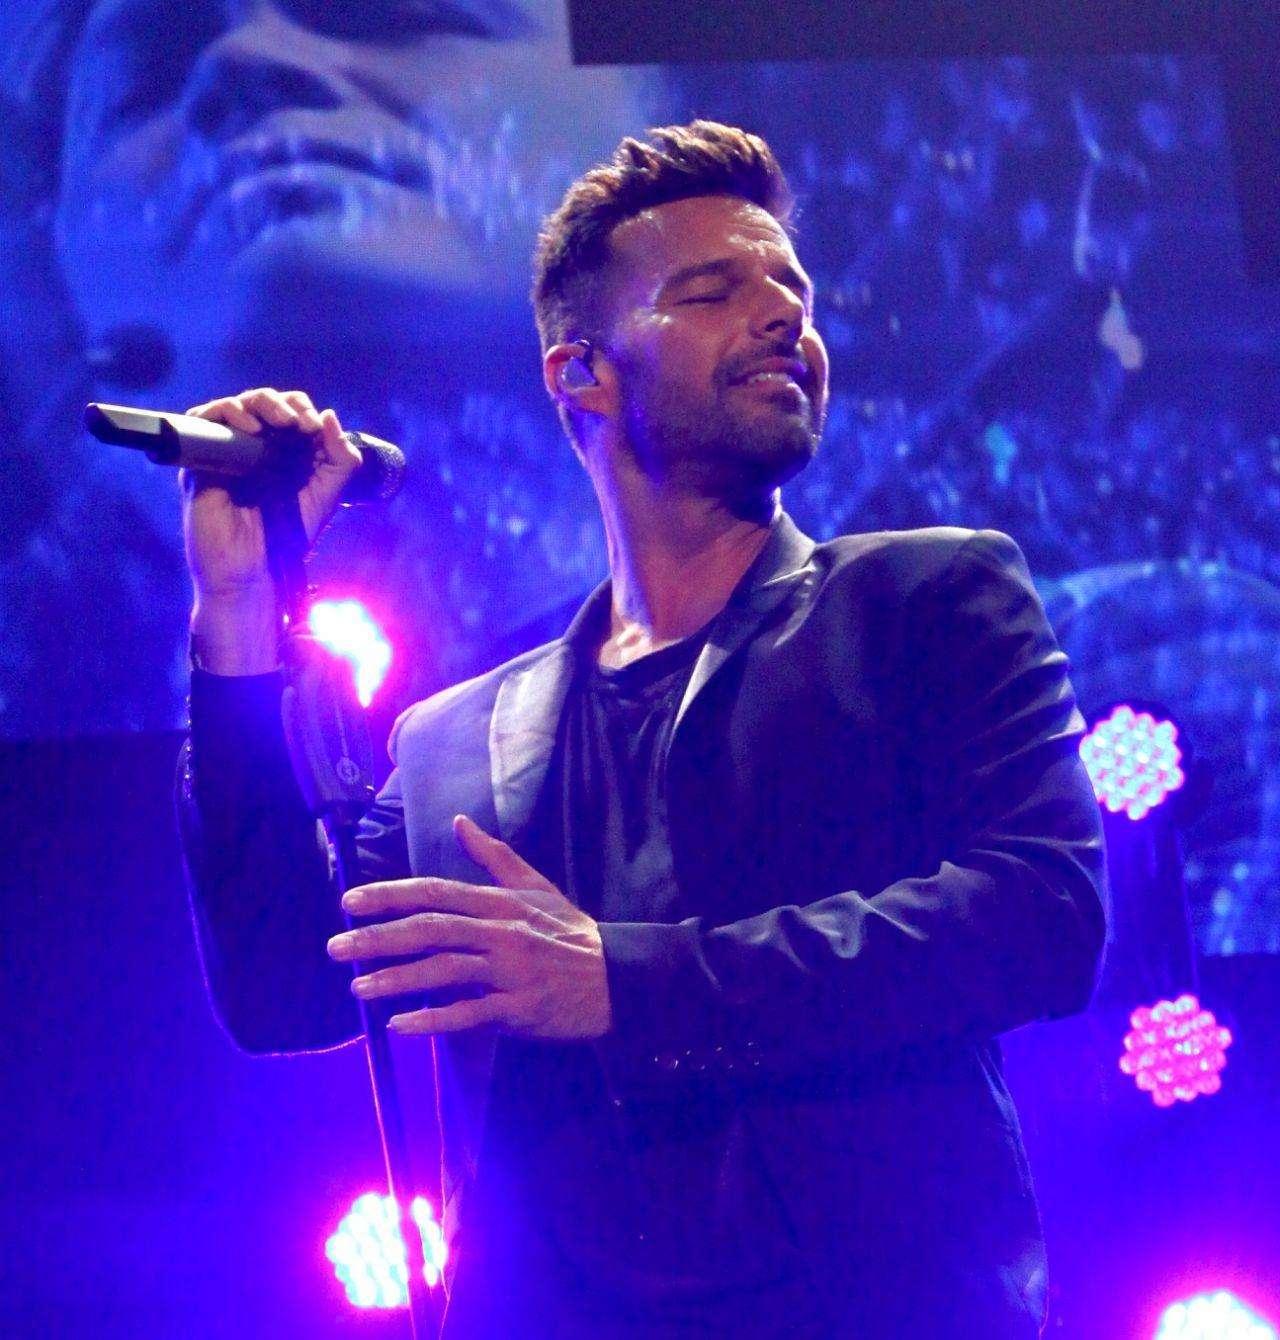 Ricky Martin no anda buscando novio Foto: Agencia Mezcalent